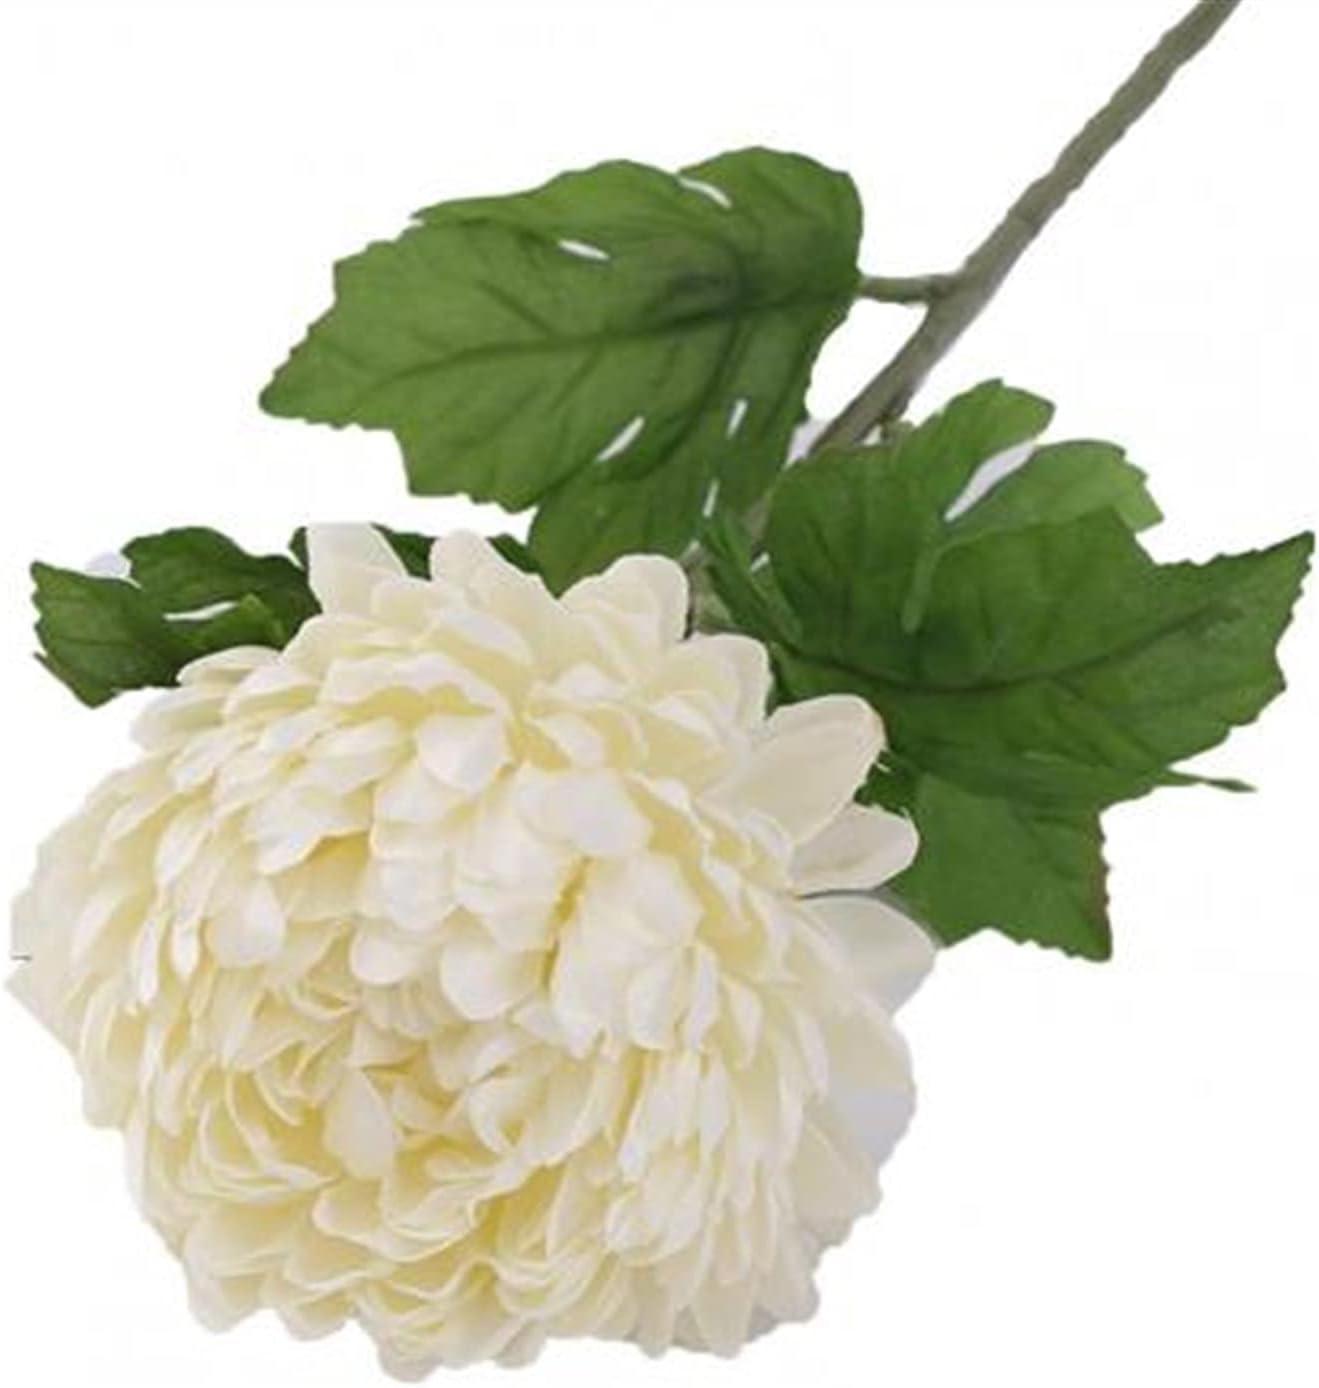 MFLJU Artificial Flowers Faux Plants Max 46% OFF Colors Silk Large 5 price